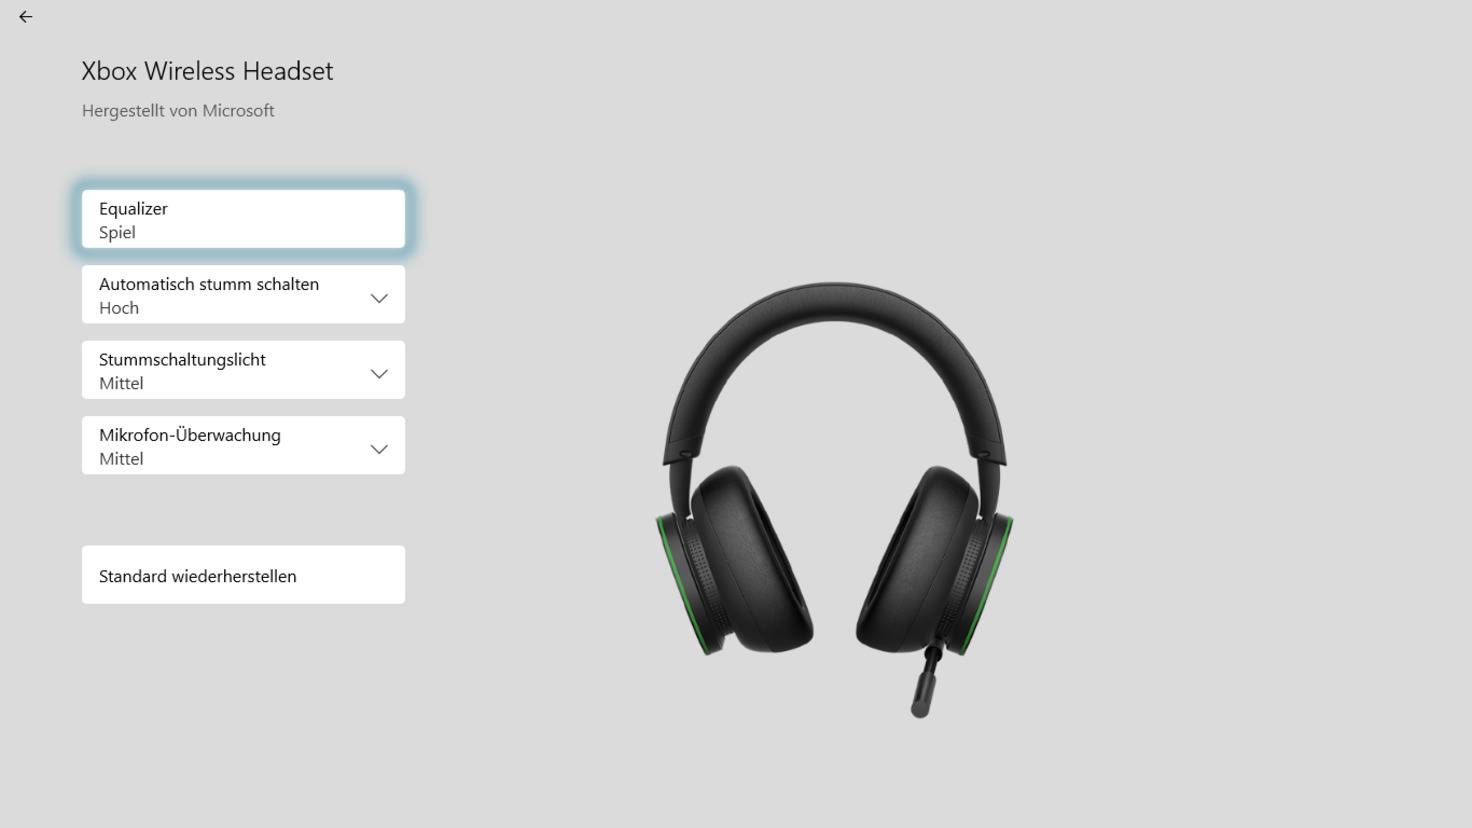 microsoft-xbox-wireless-headset-settings